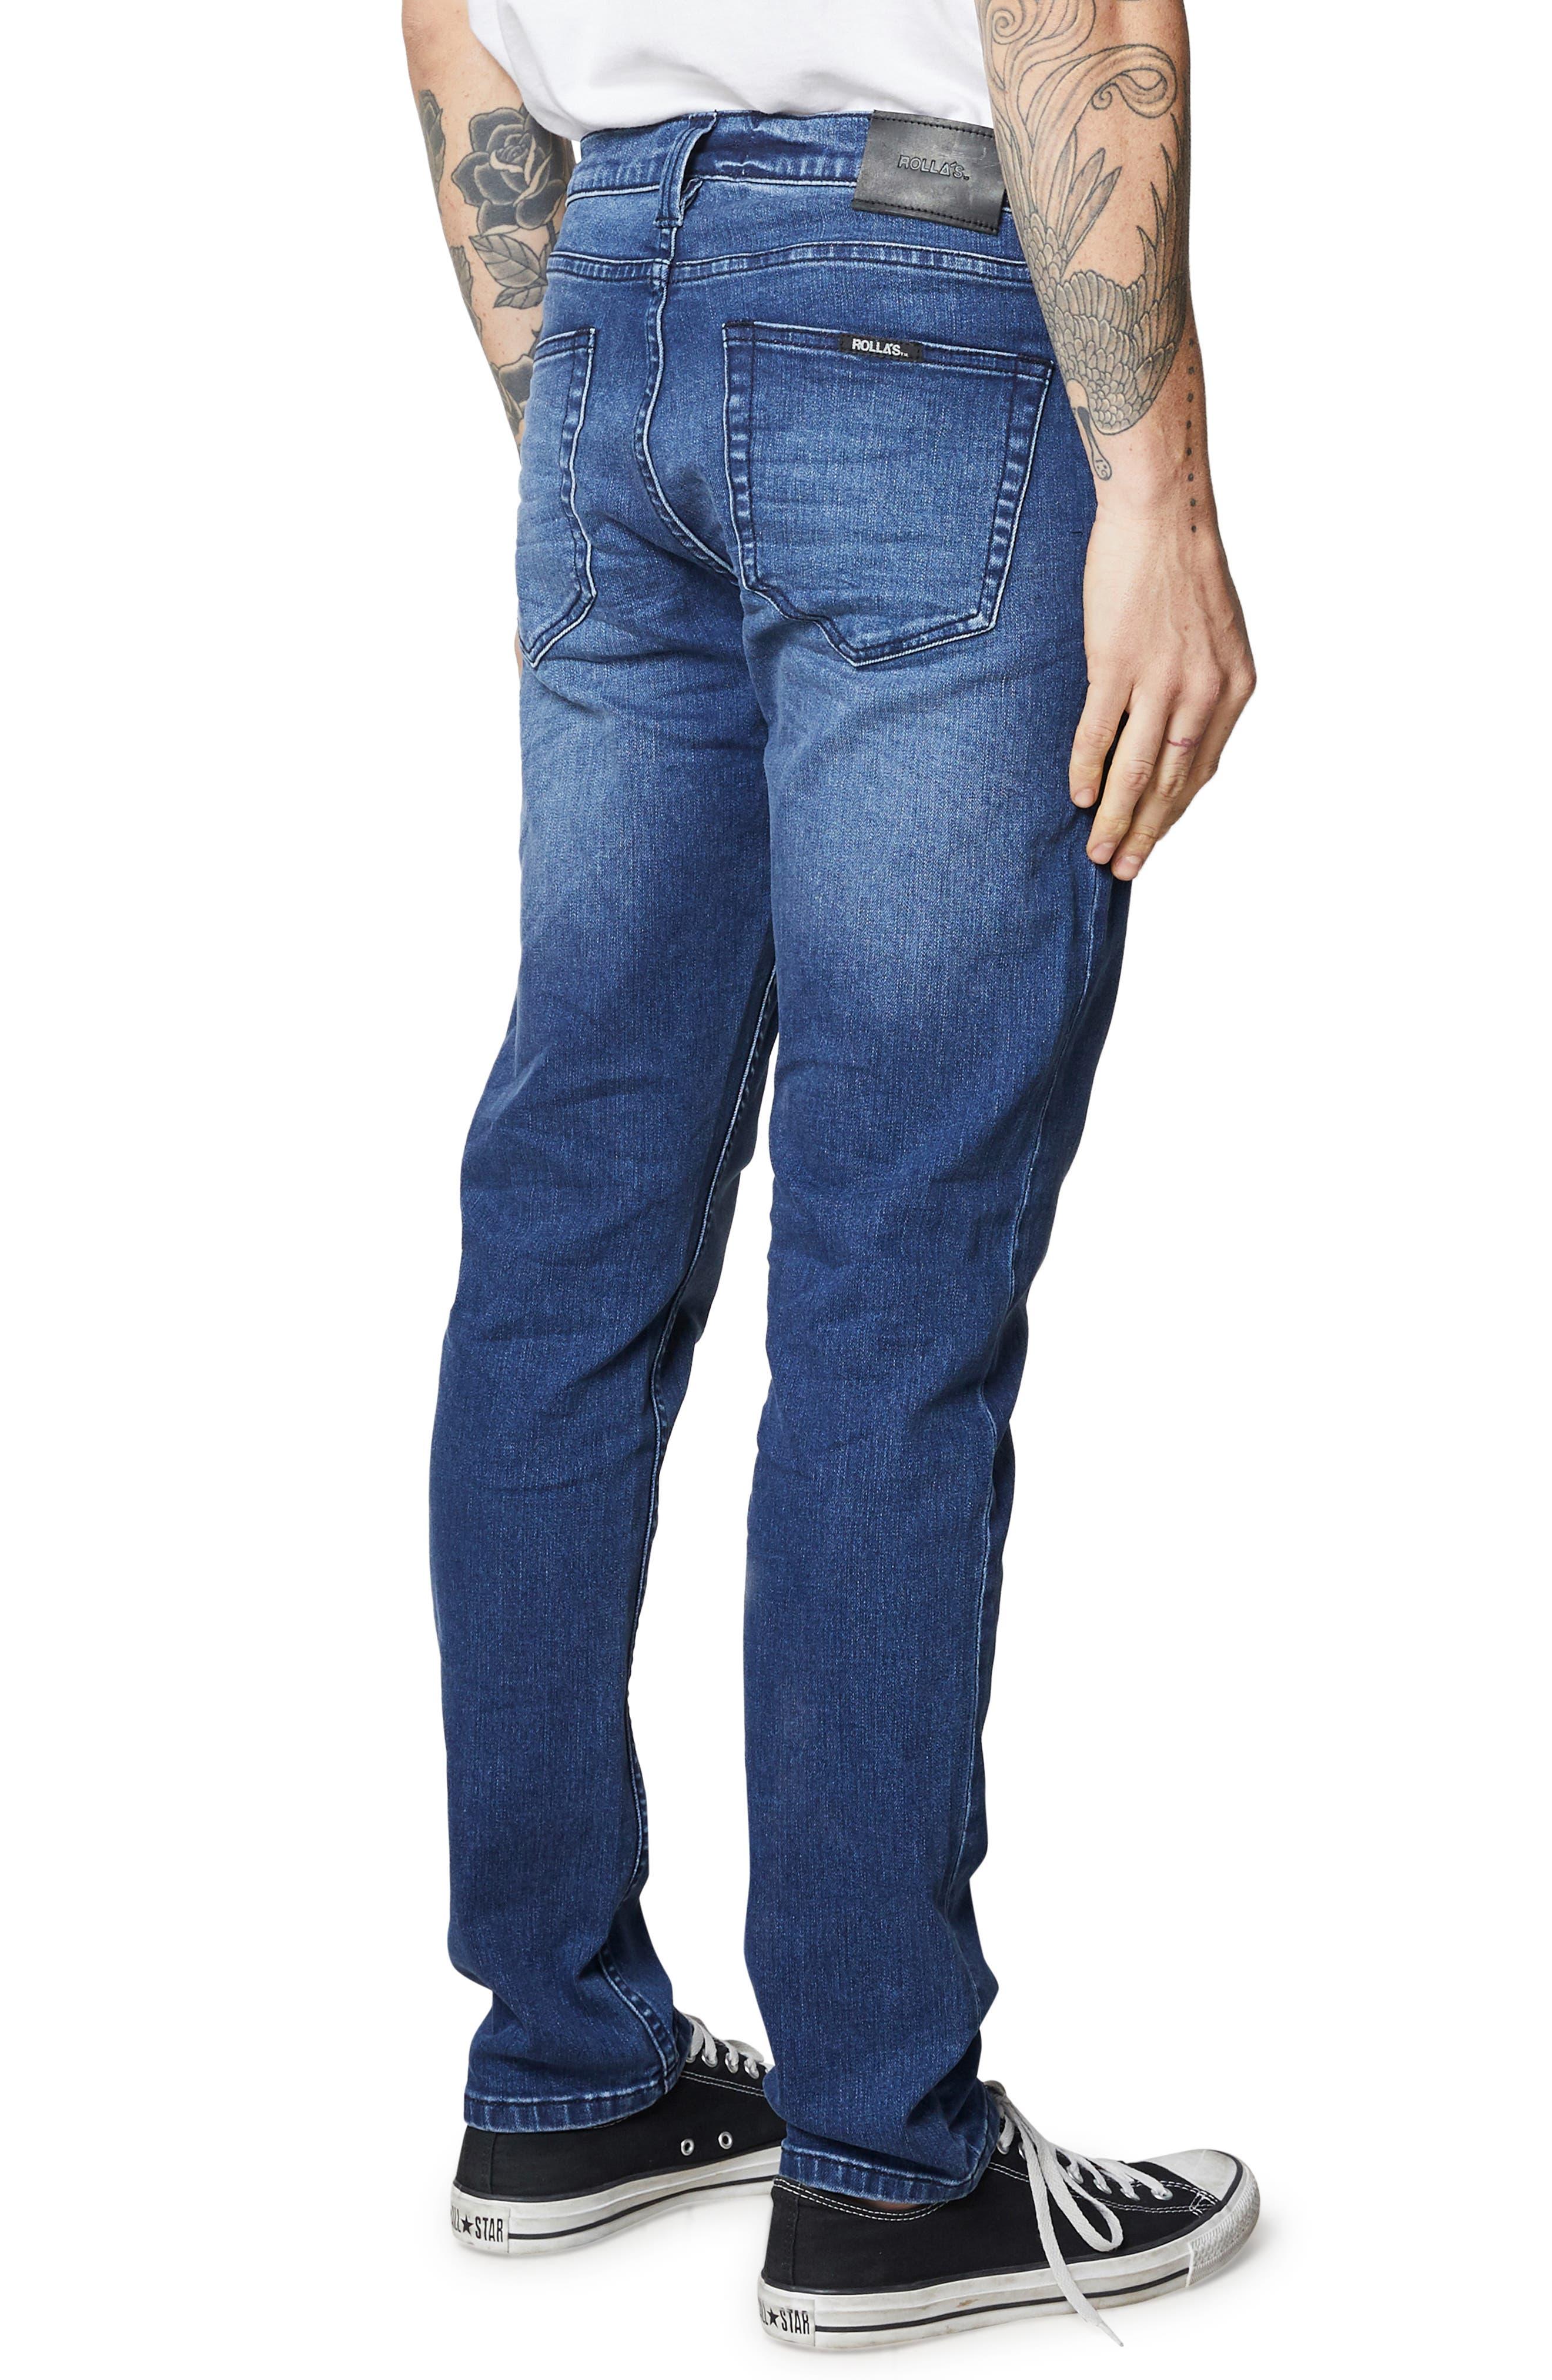 Tim Slims Slim Fit Jeans,                             Alternate thumbnail 4, color,                             FOSTERS BLUE